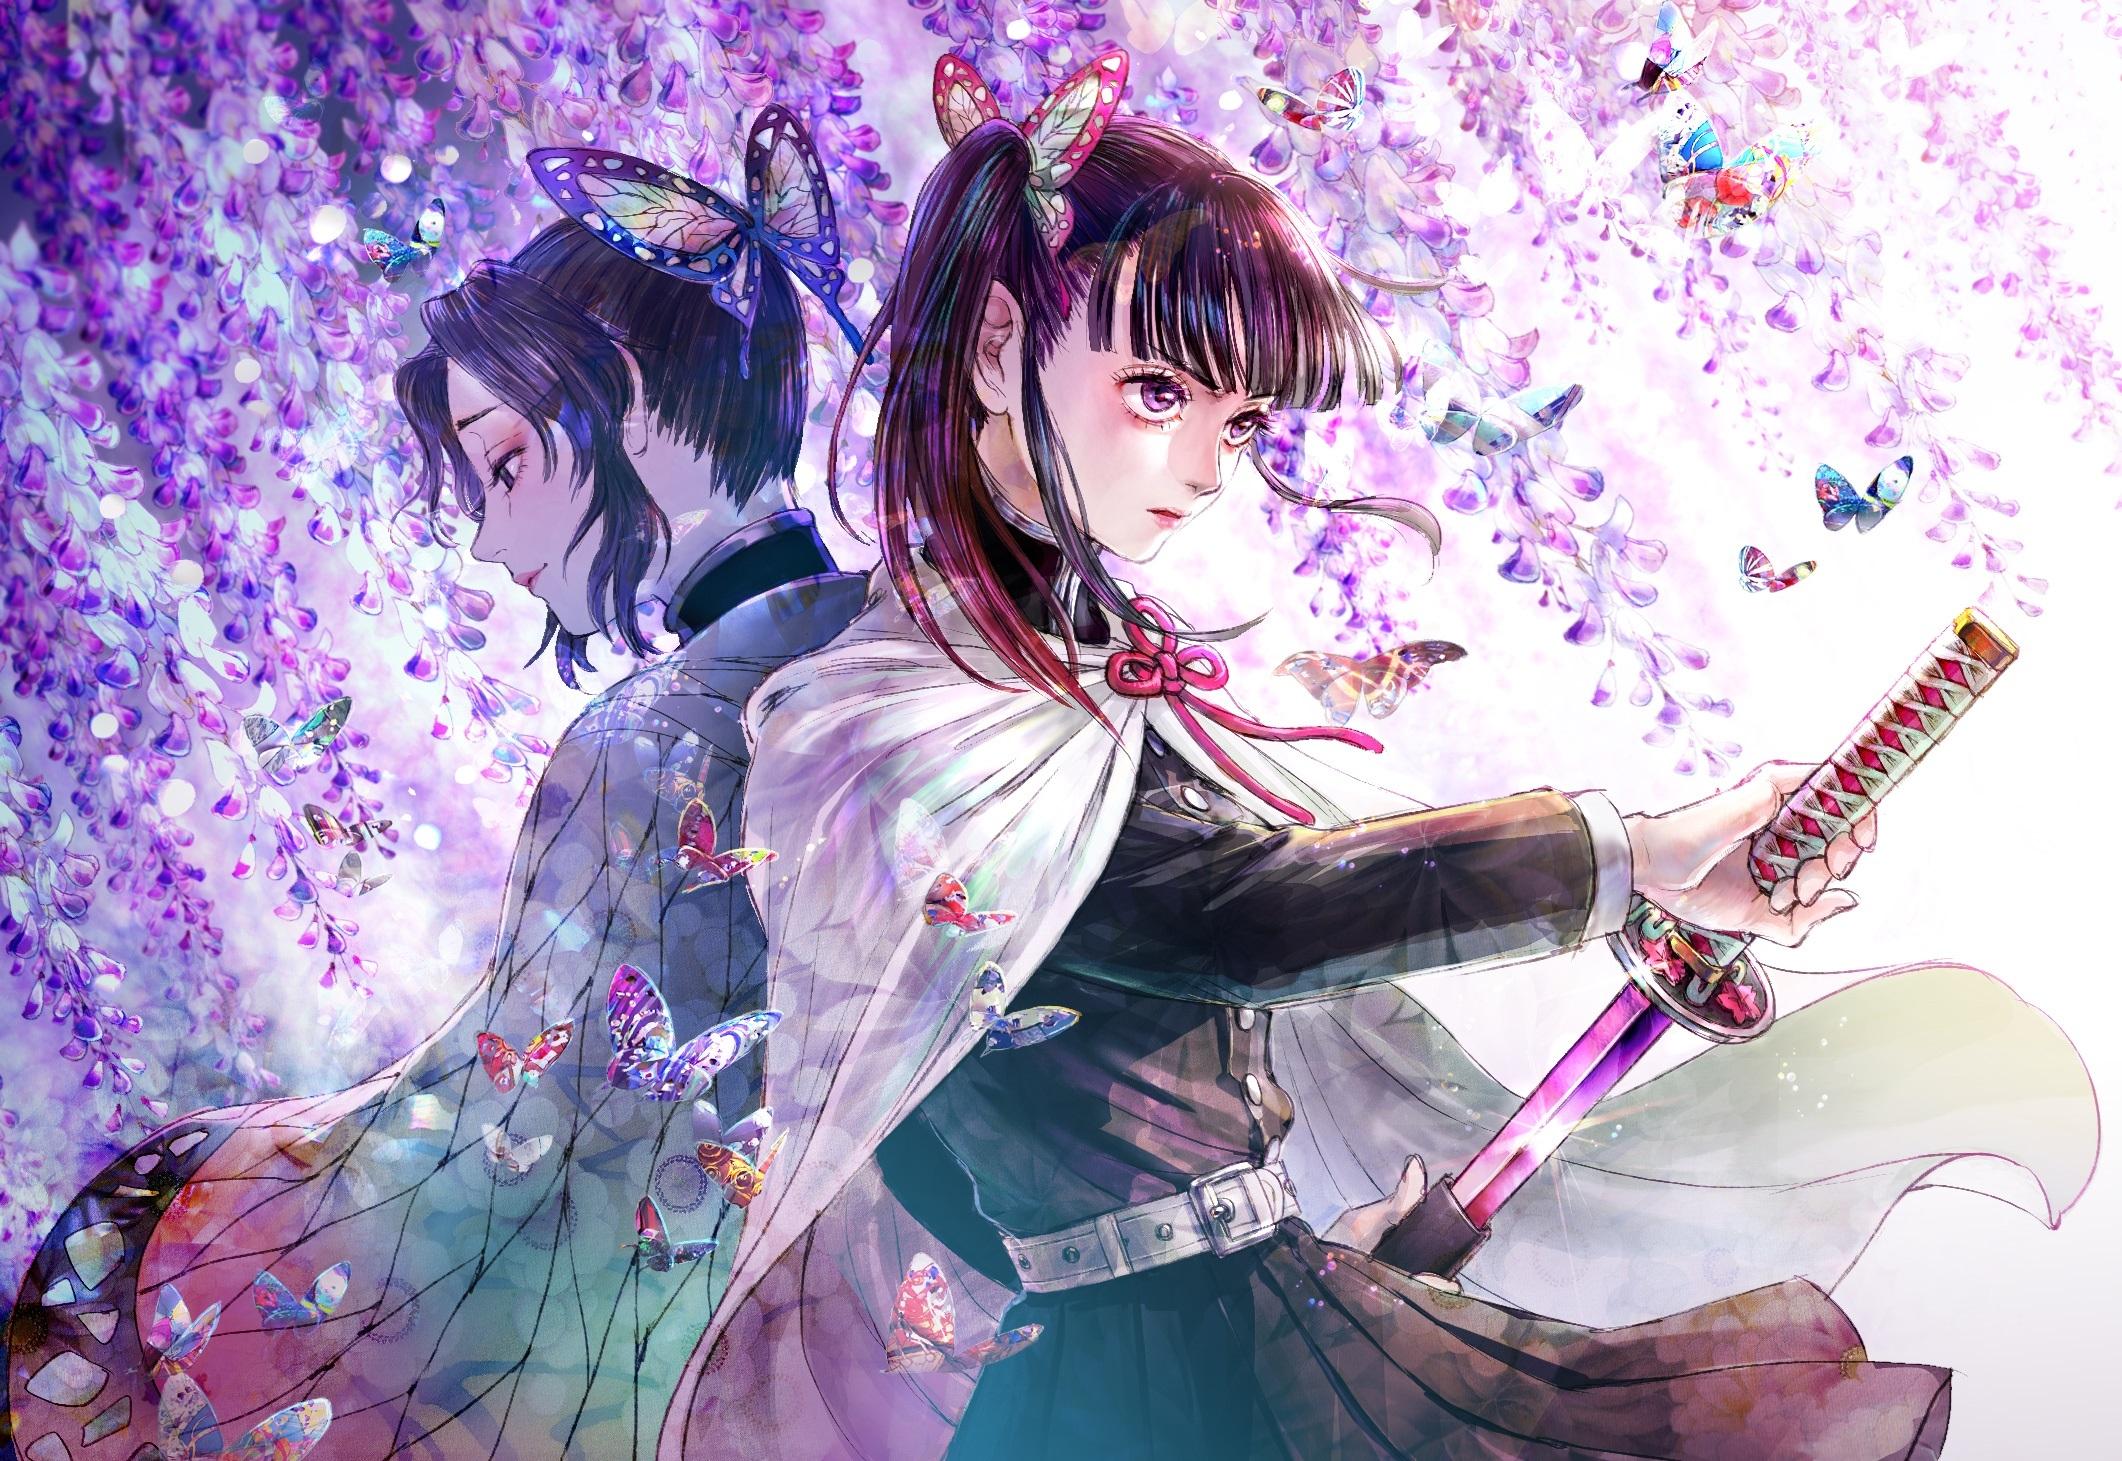 720x1544 Shinobu Kochou And Kanao Tsuyuri 720x1544 Resolution Wallpaper Hd Anime 4k Wallpapers Images Photos And Background